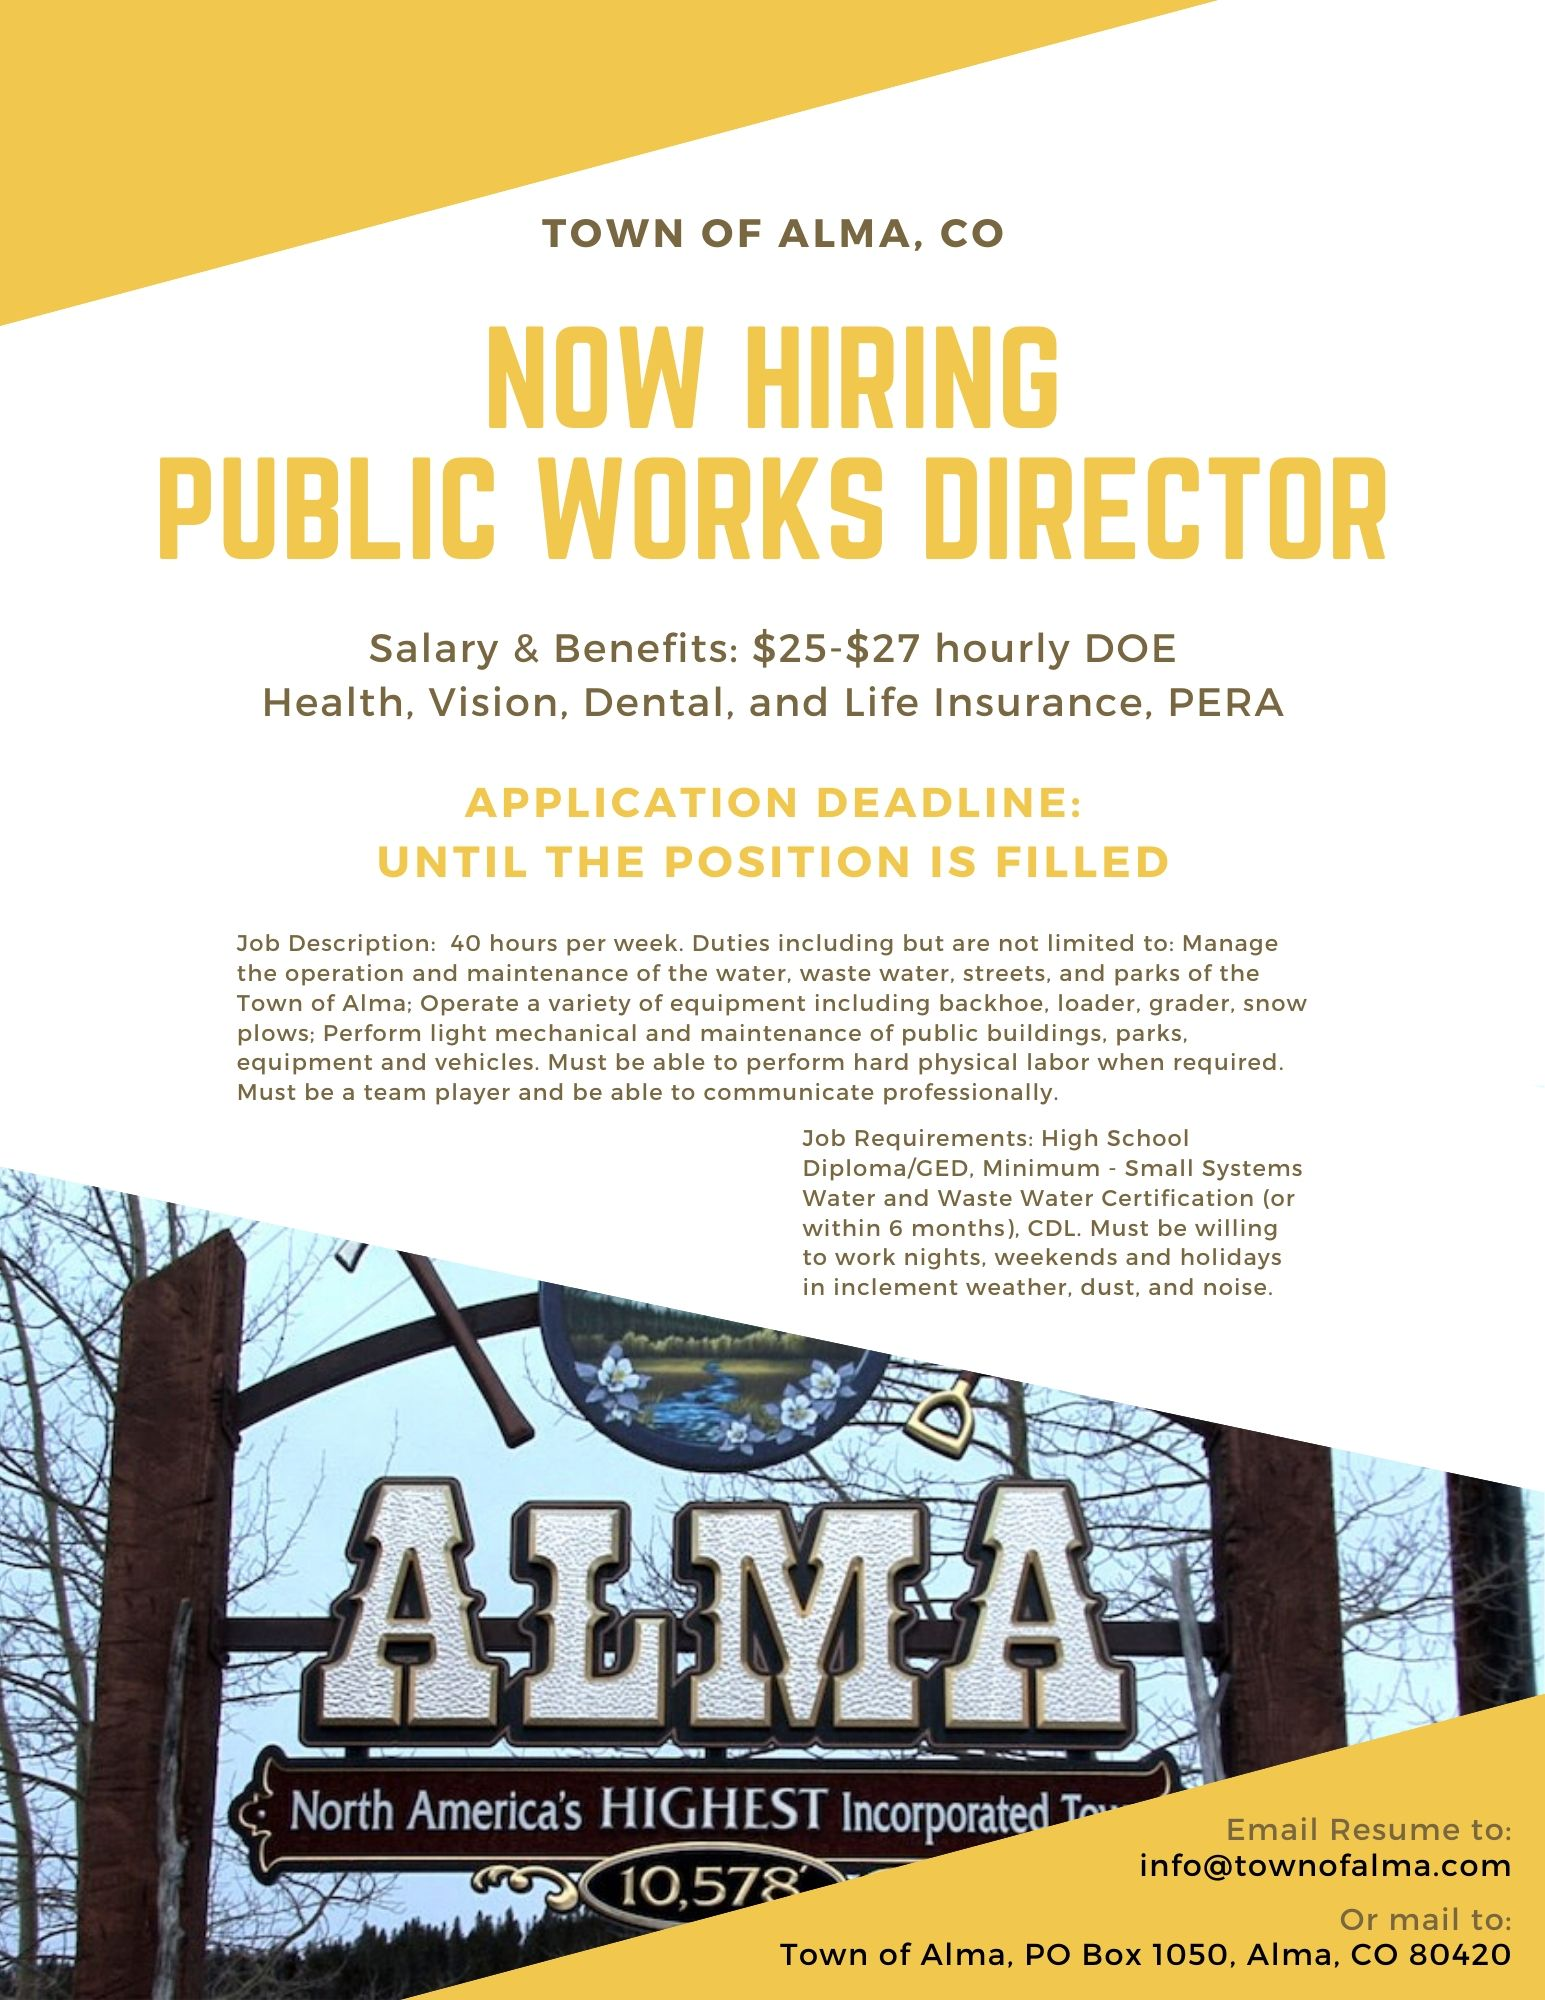 TOA Hiring Public Works Director